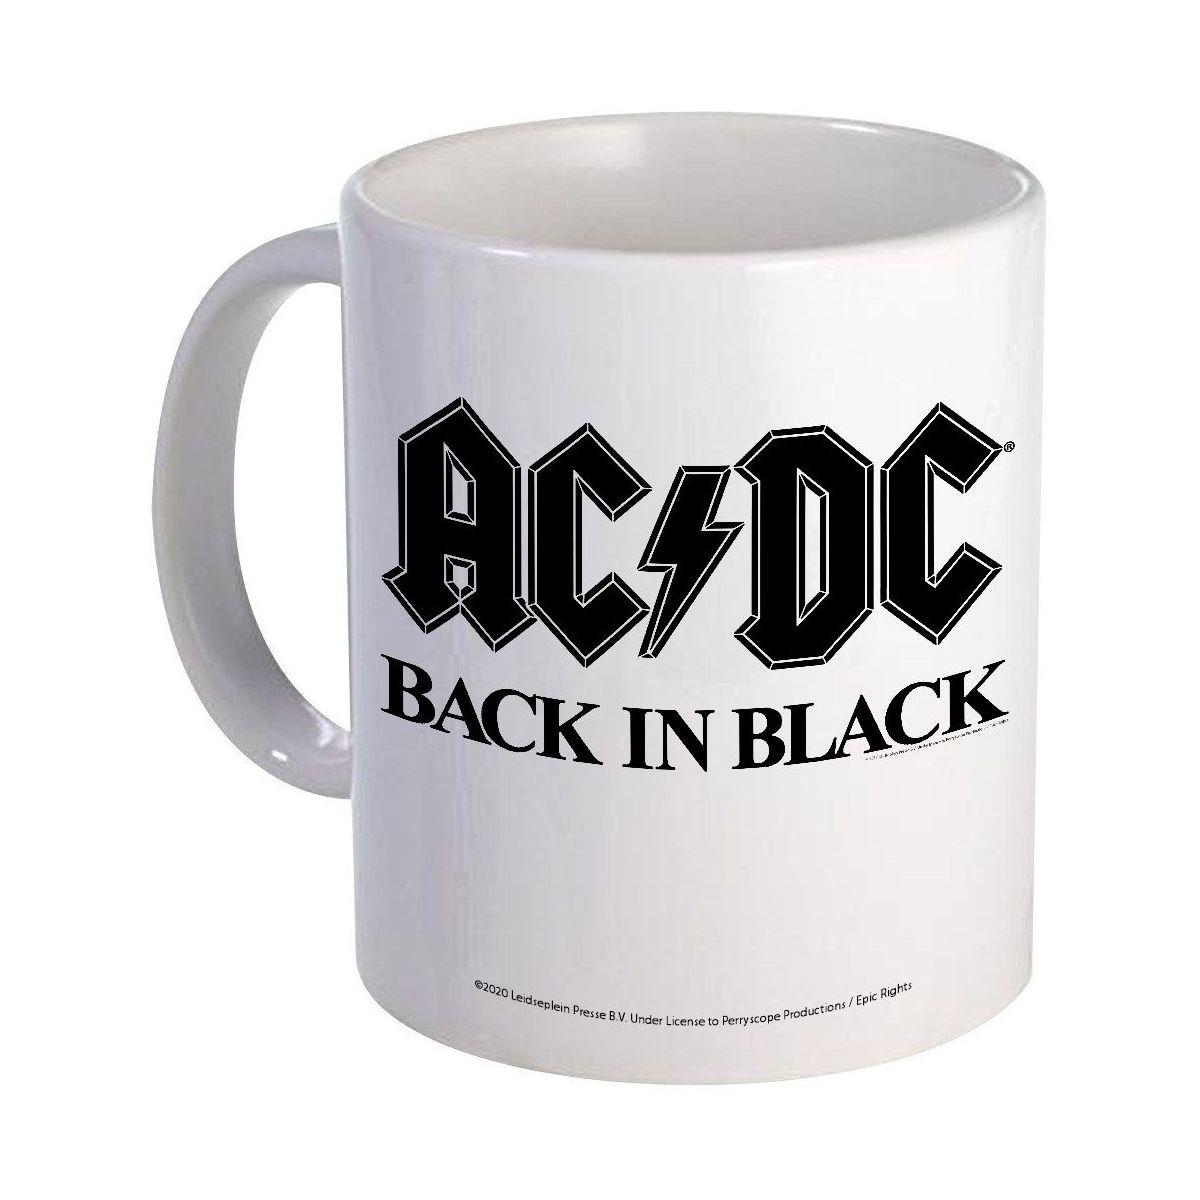 Back In Black Type Mug